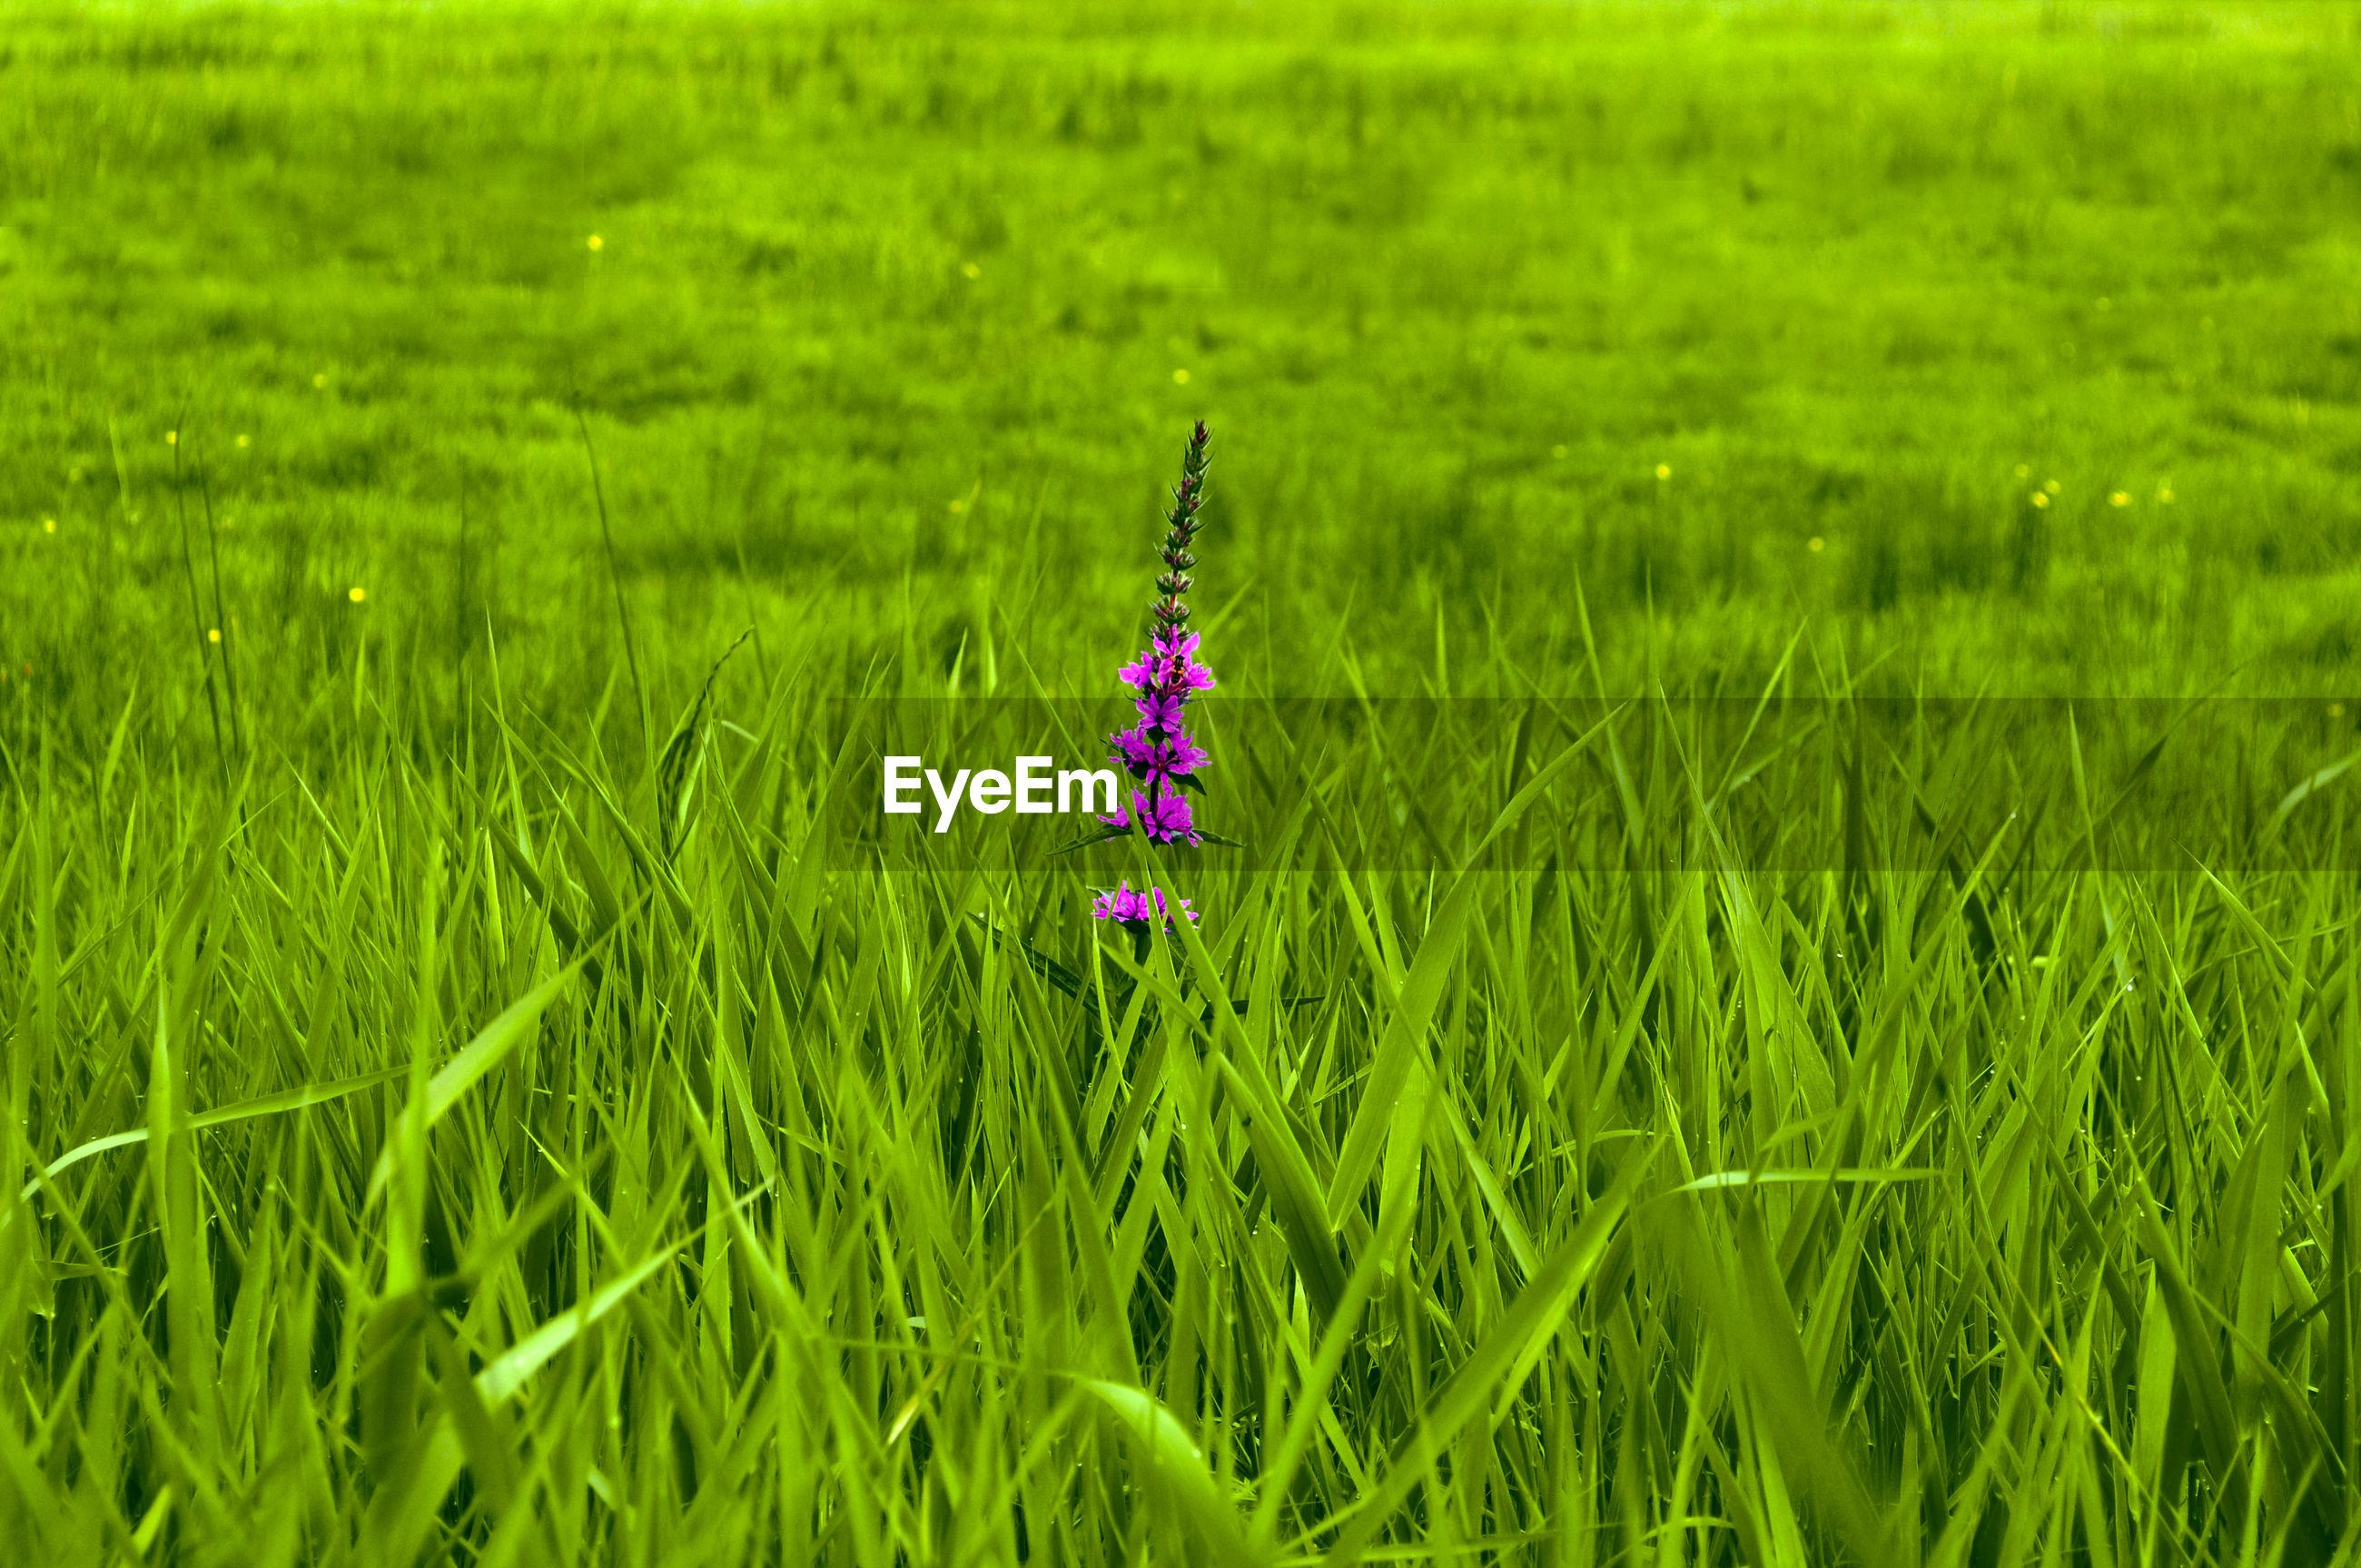 UMBRELLA ON GRASS FIELD